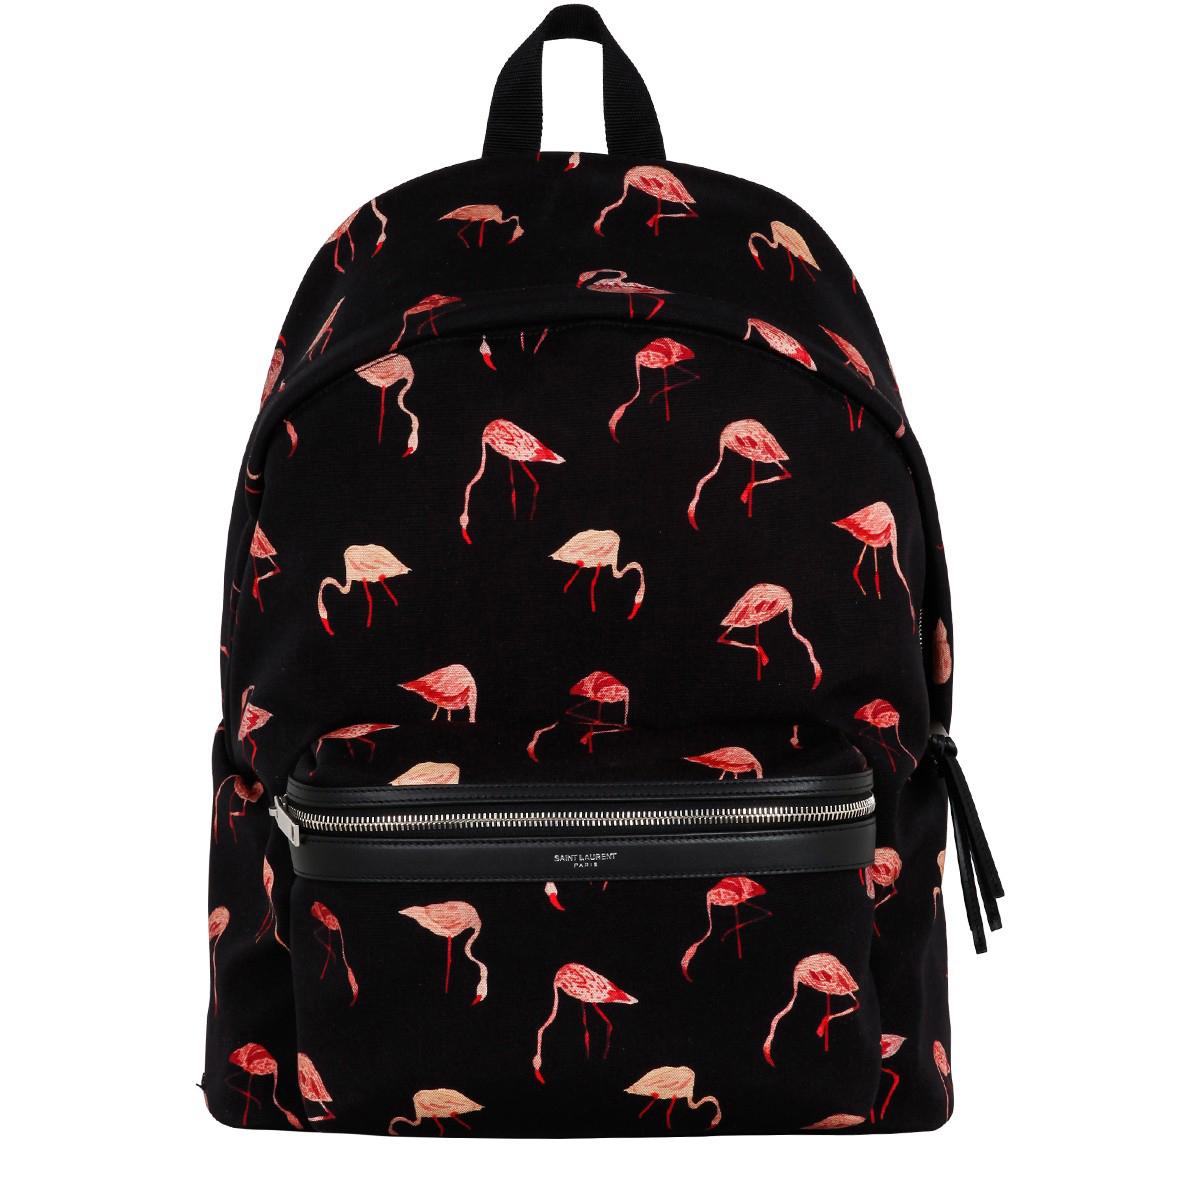 saint_laurent_city_backpack_front.jpg